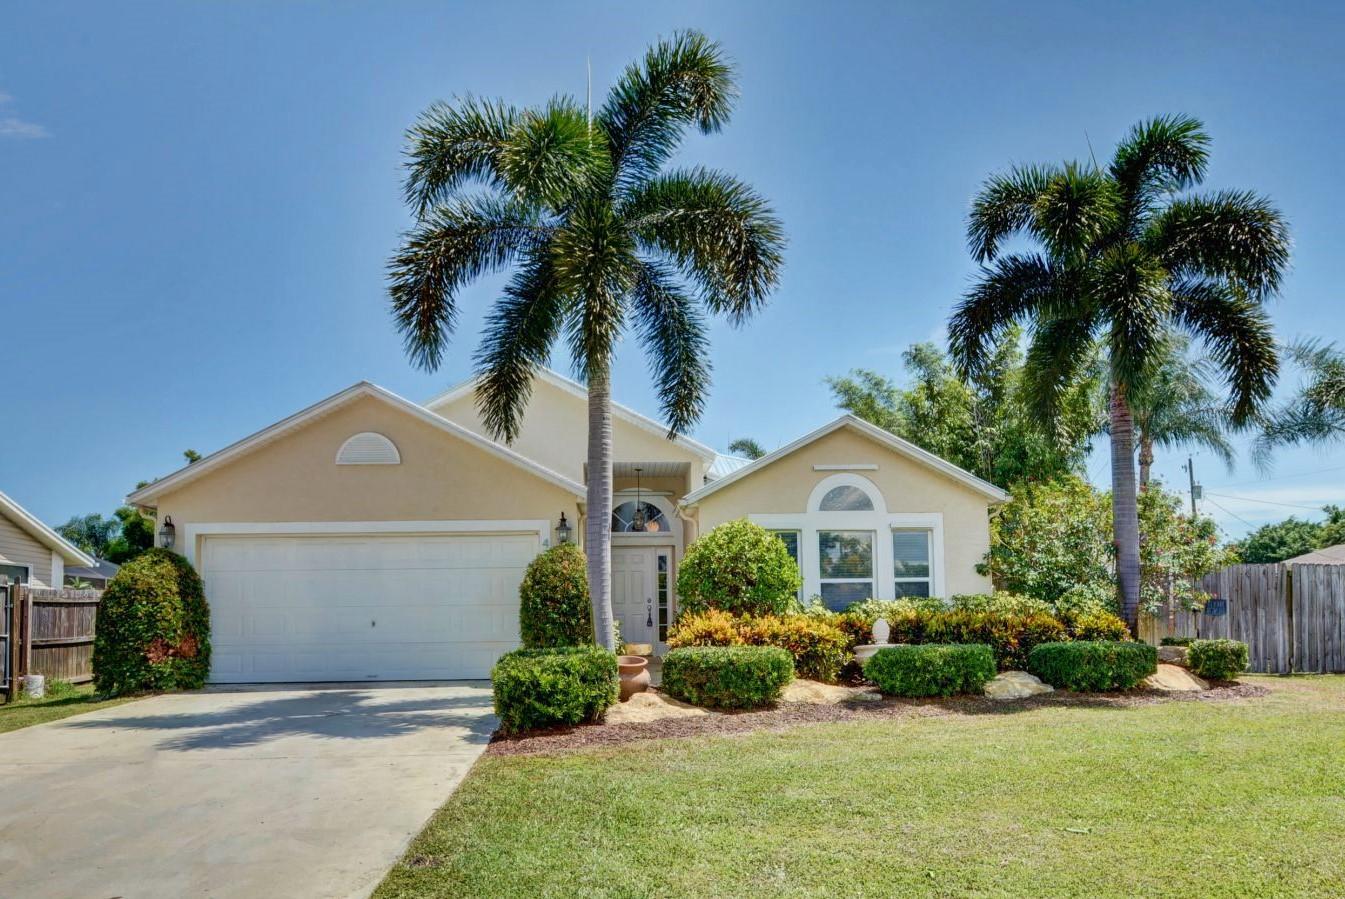 475 Sw Friar Street, Port Saint Lucie, FL 34983